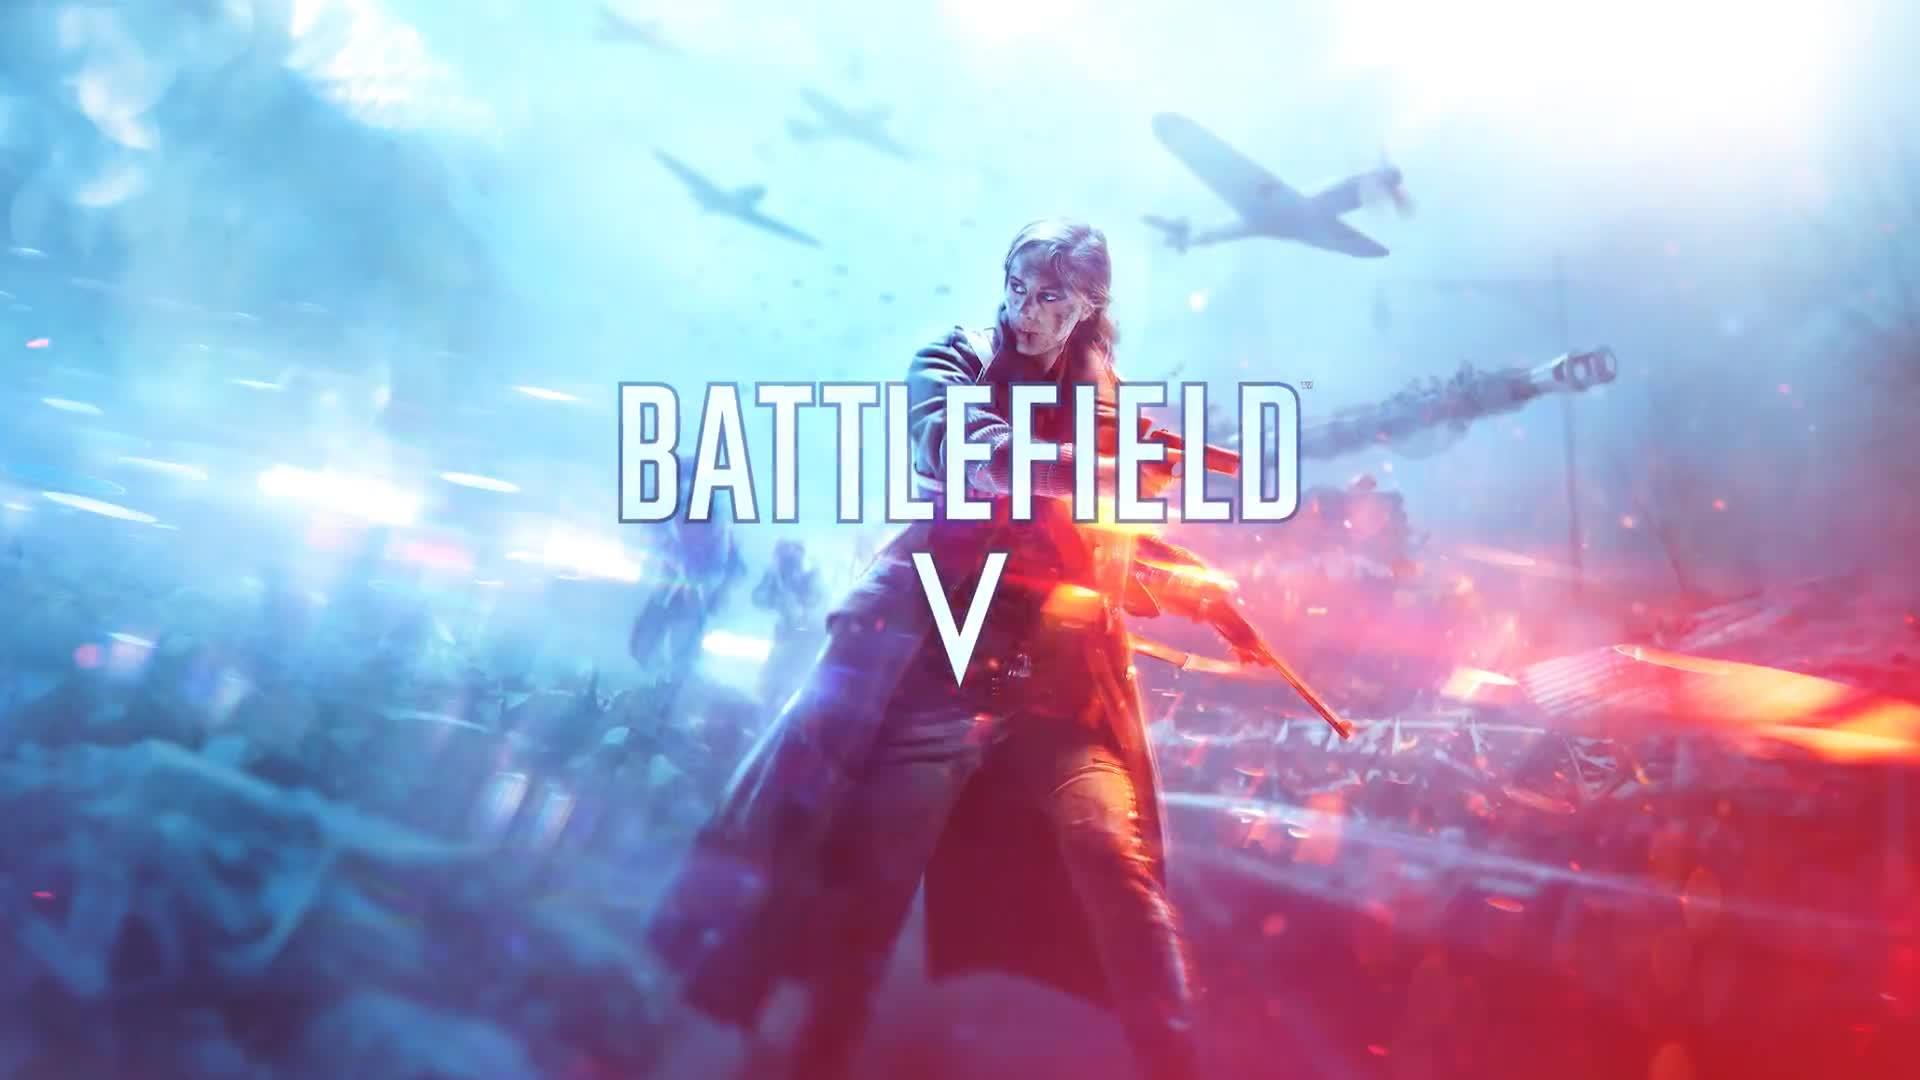 Trailer, Electronic Arts, Ego-Shooter, Ea, Shooter, Battlefield, Dice, Battlefield 5, Battlefield V